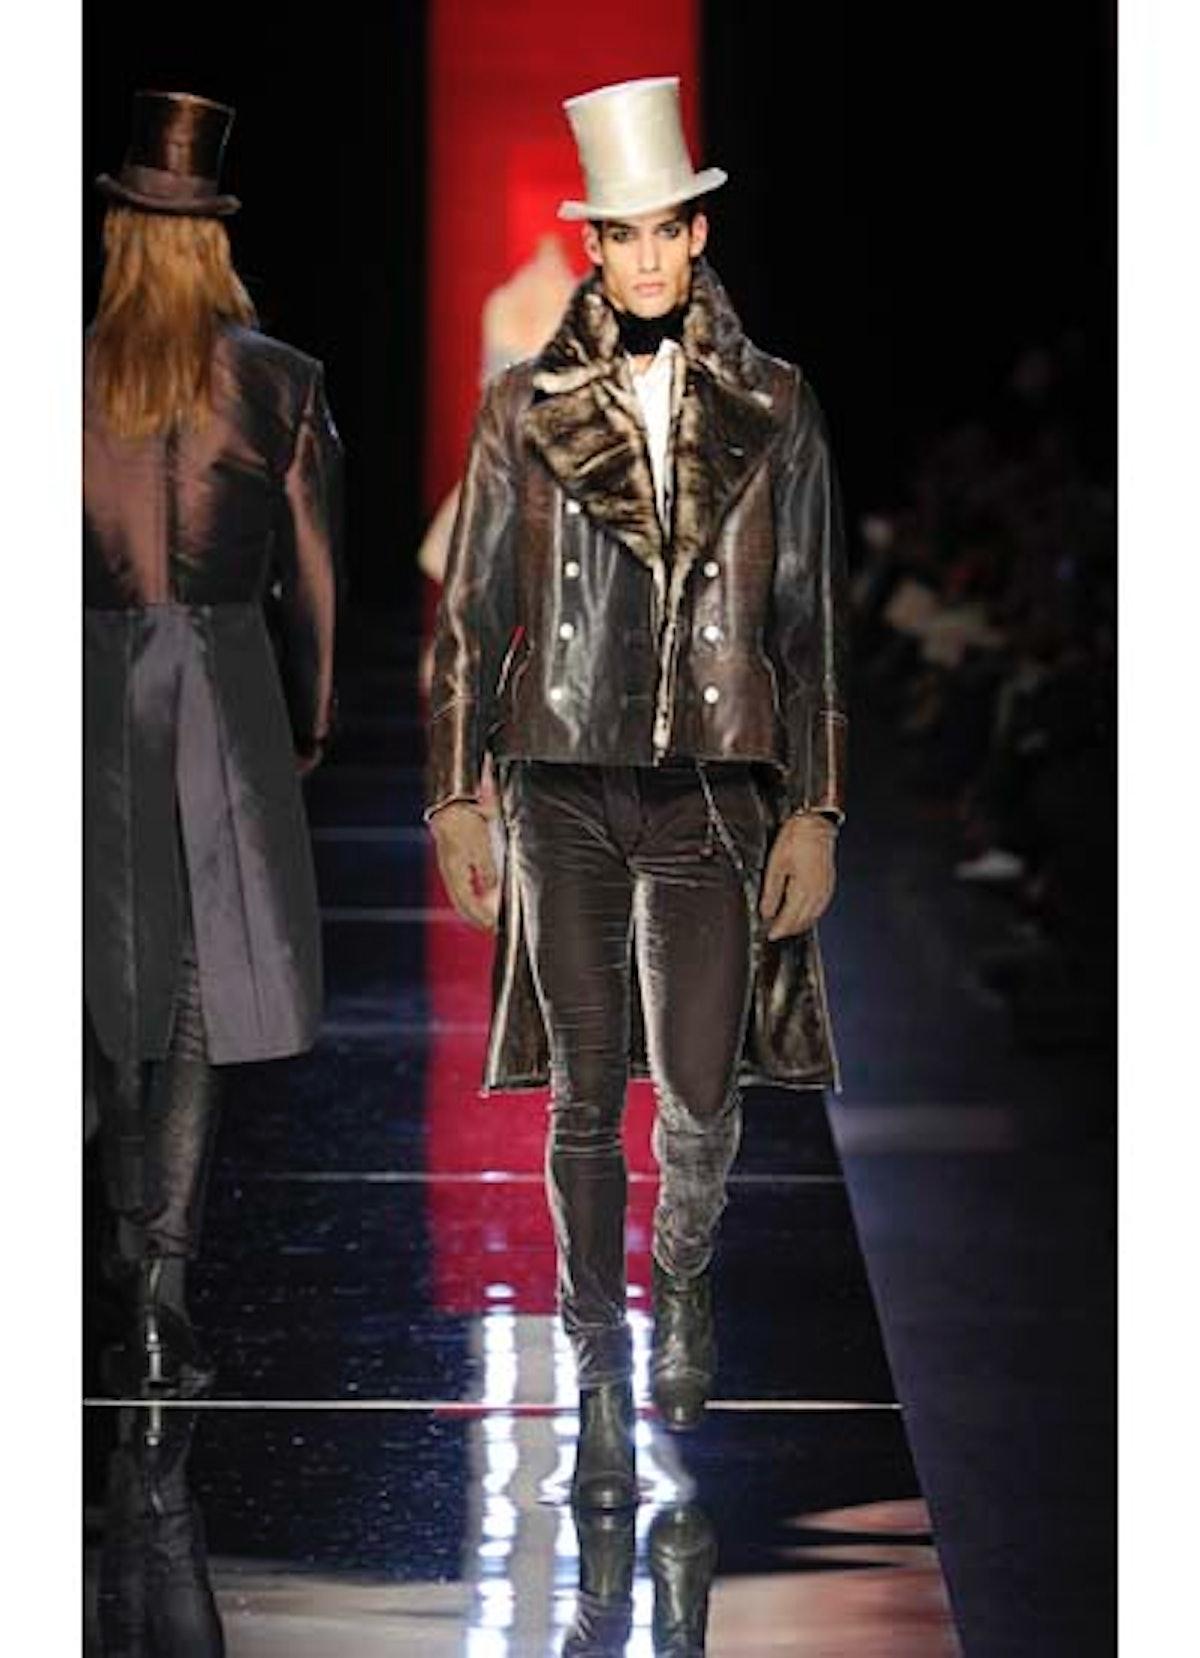 fass-jean-paul-gaultier-couture-2012-runway-23-v.jpg